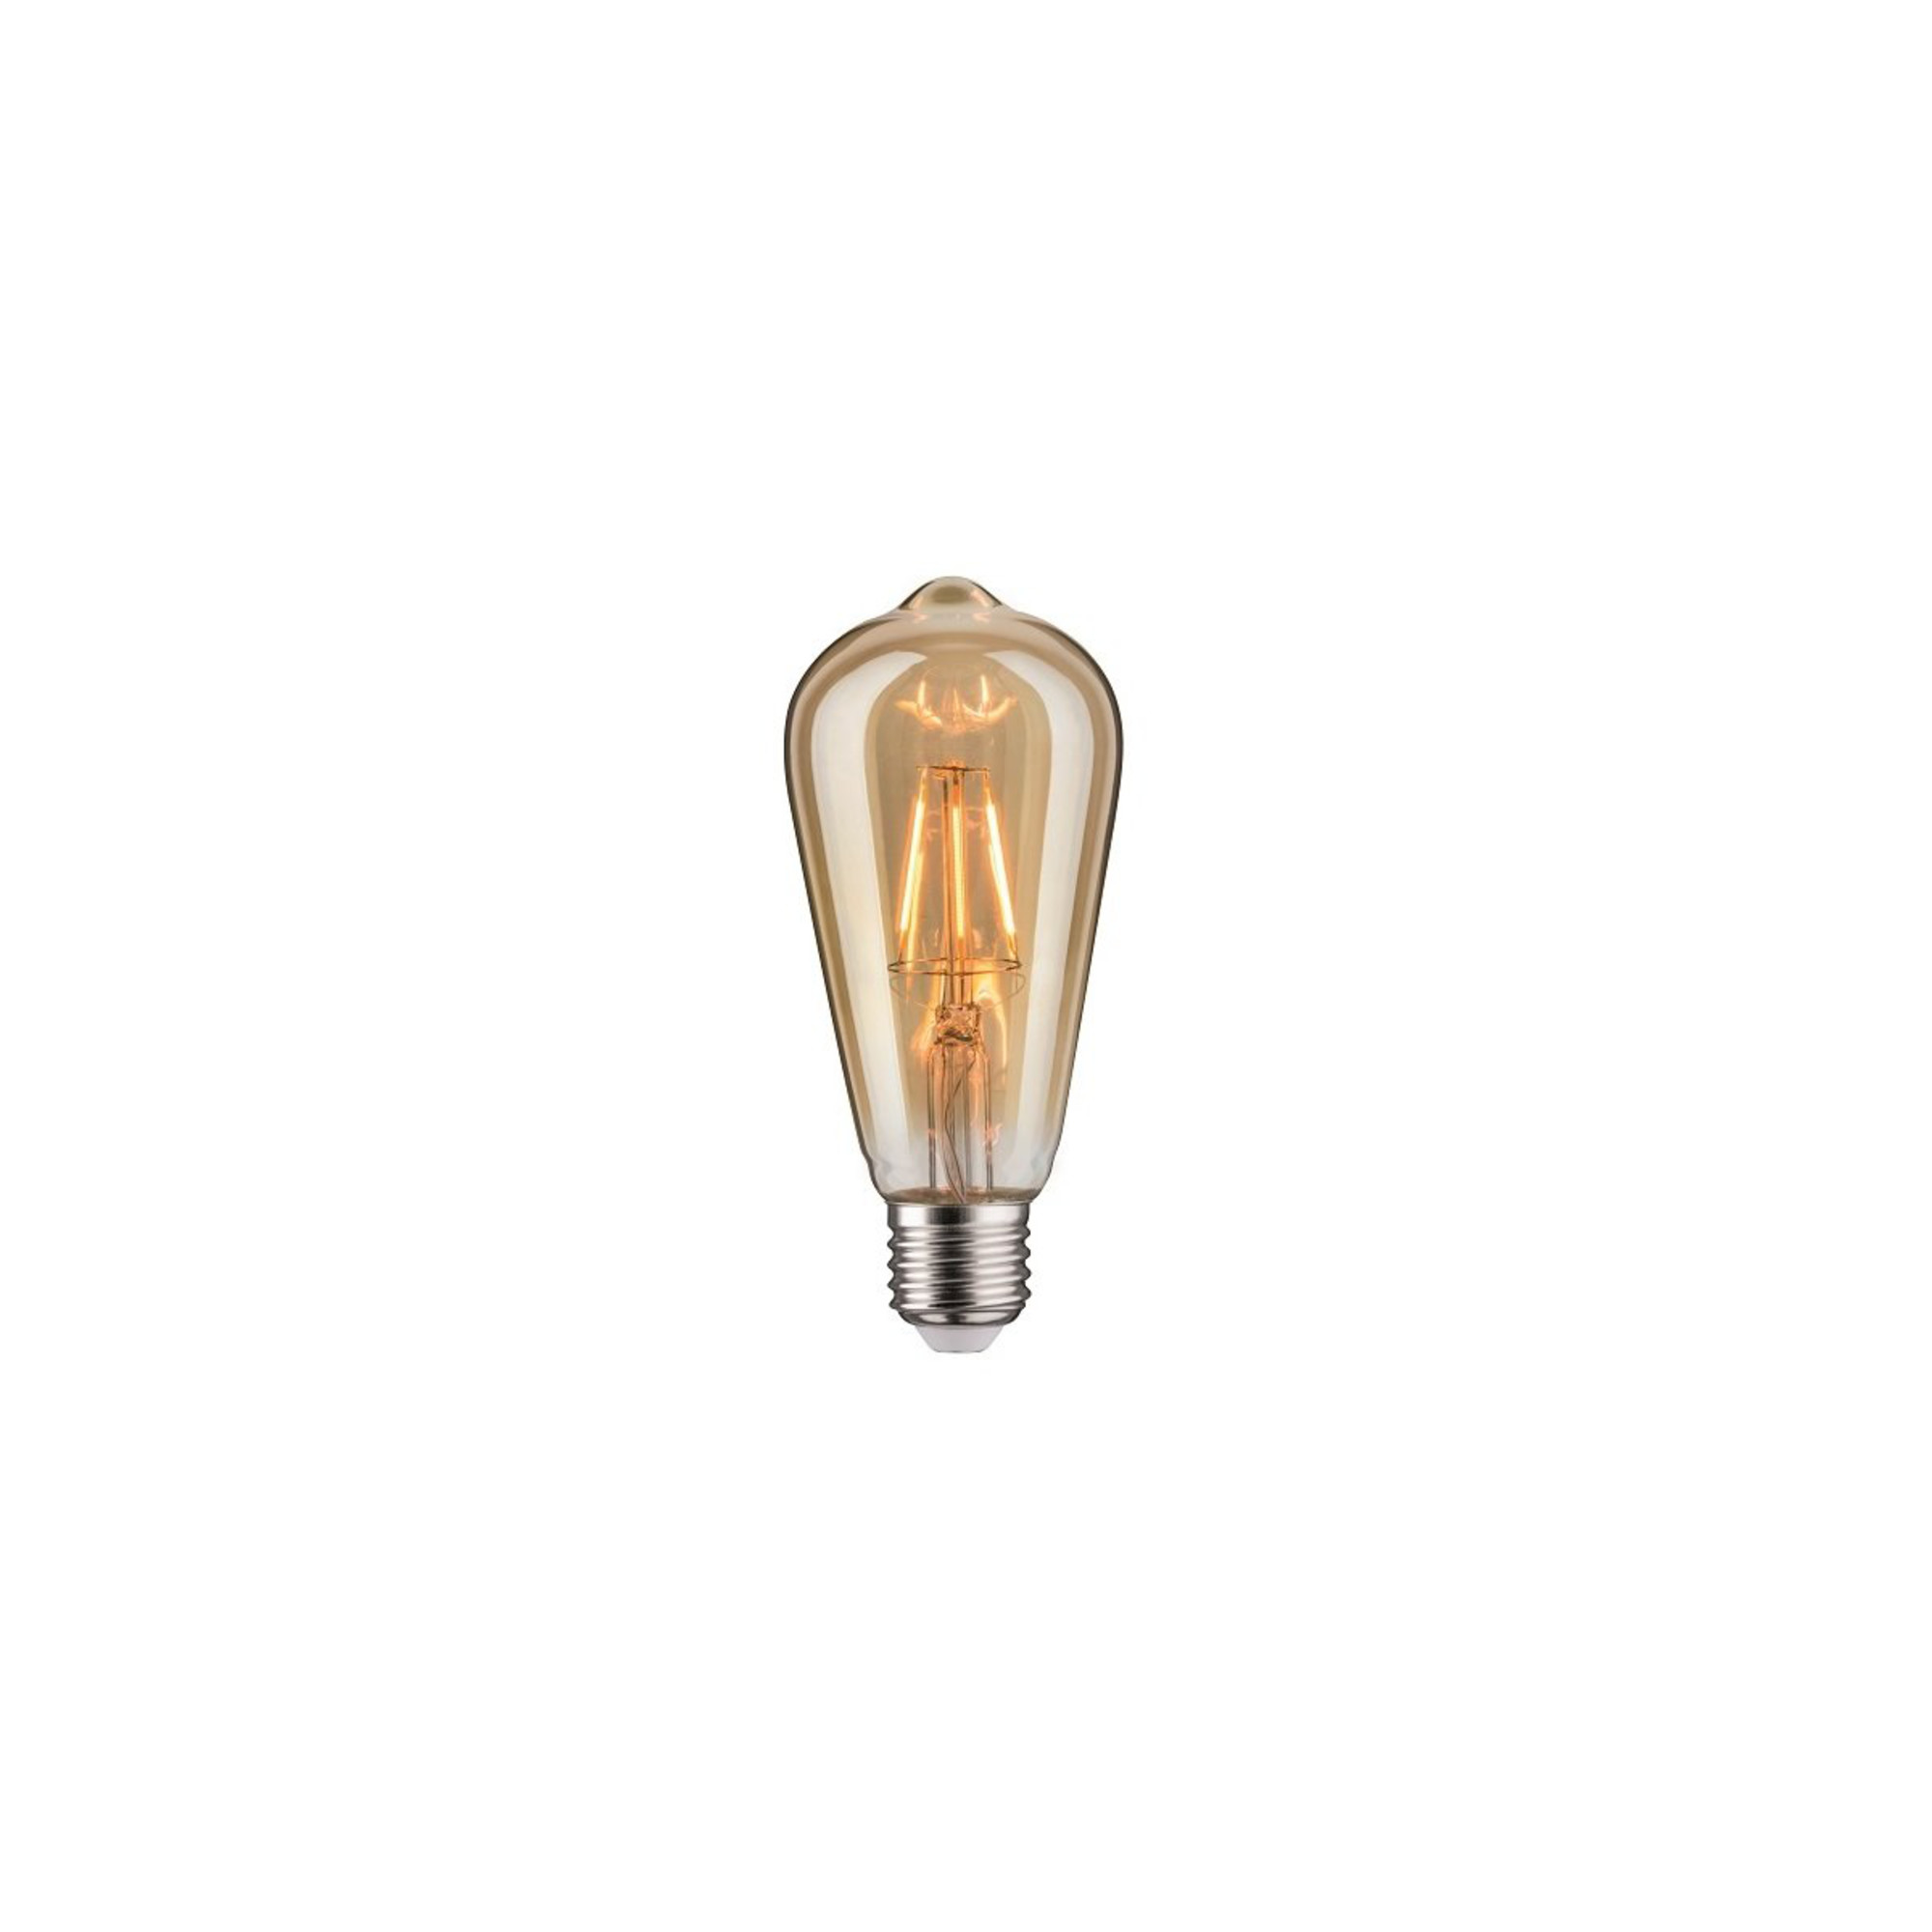 Лампа филаментная Paulmann Vintage ST64 4Вт 250лм 1700К E27 230В Золото 28407.